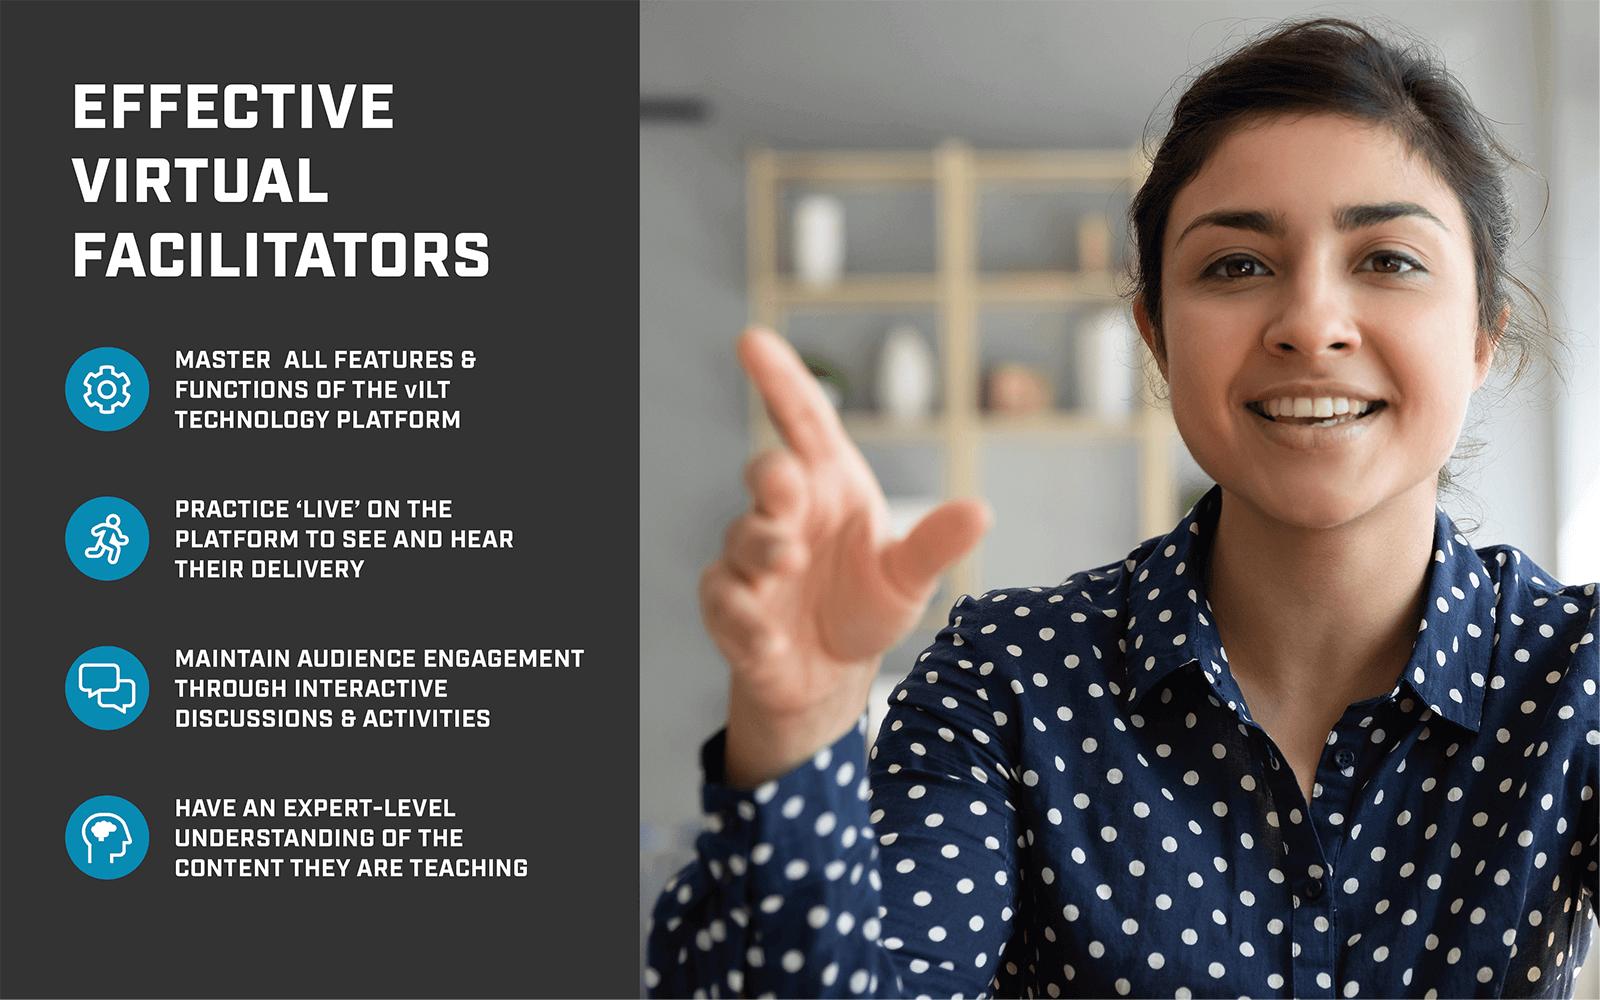 Qualities of effective virtual facilitators